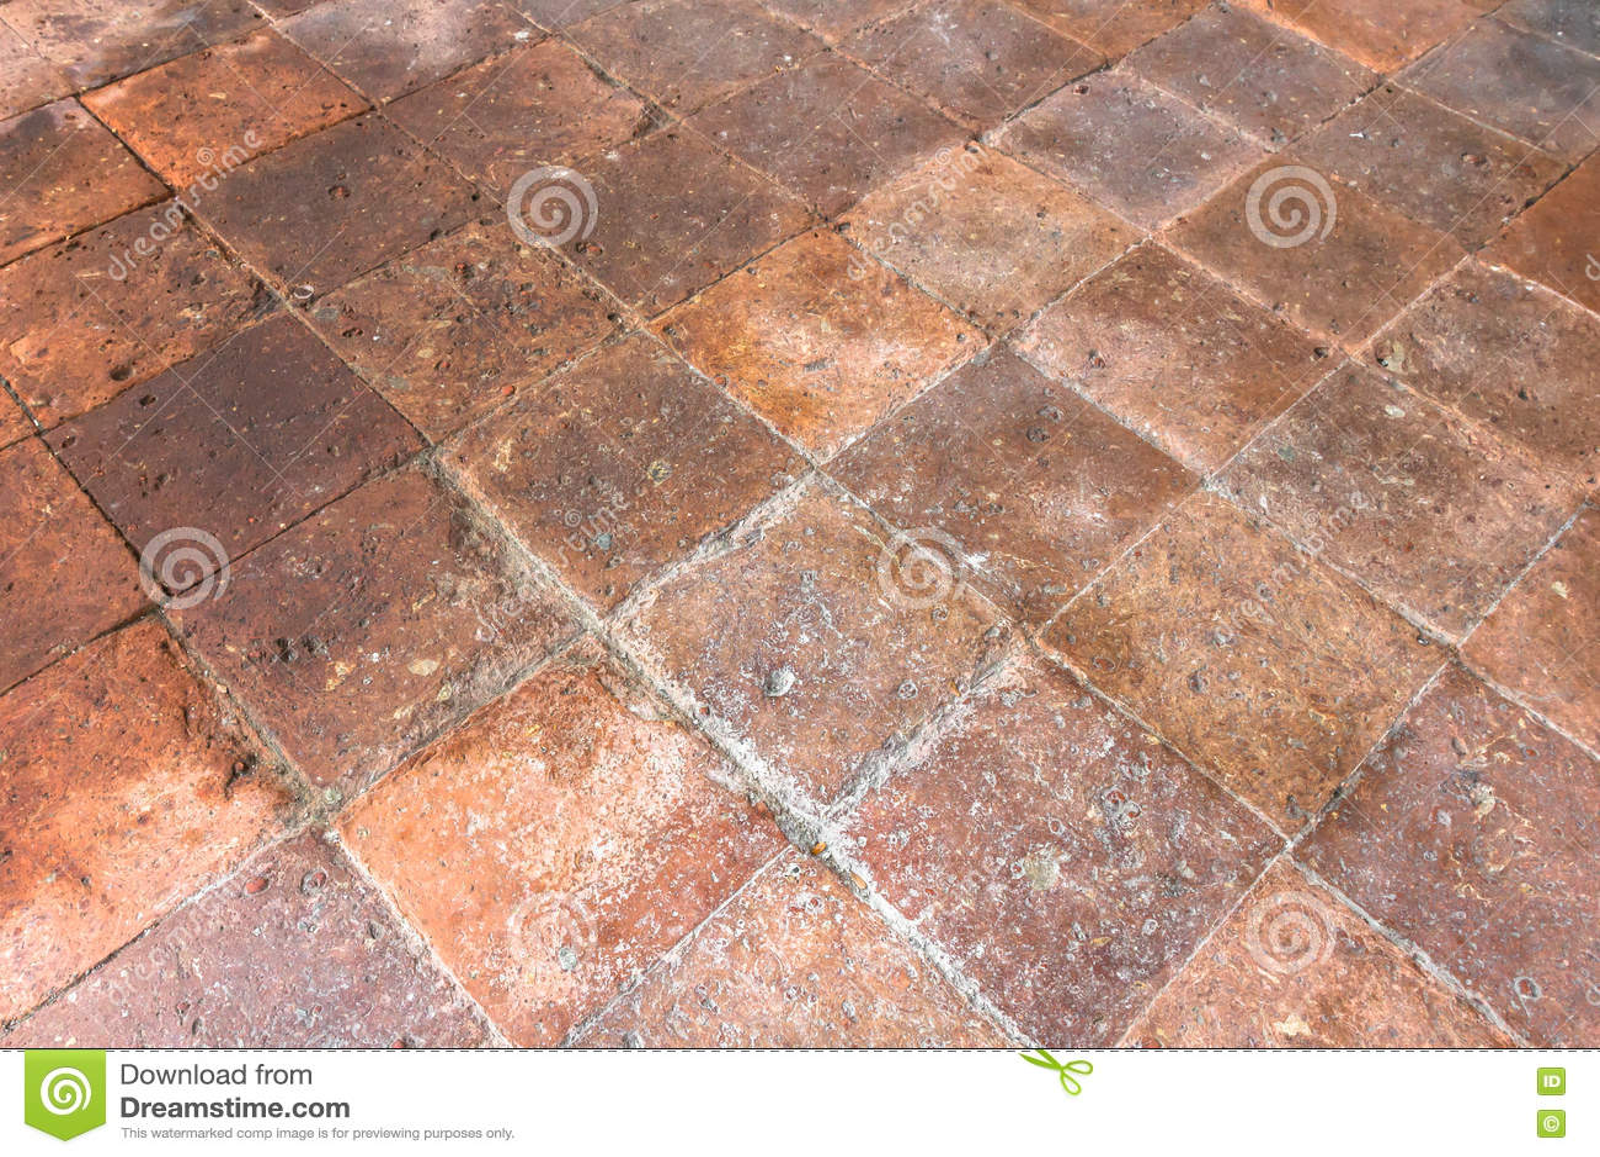 Old terracotta floor stock image  Image of home, ceramic